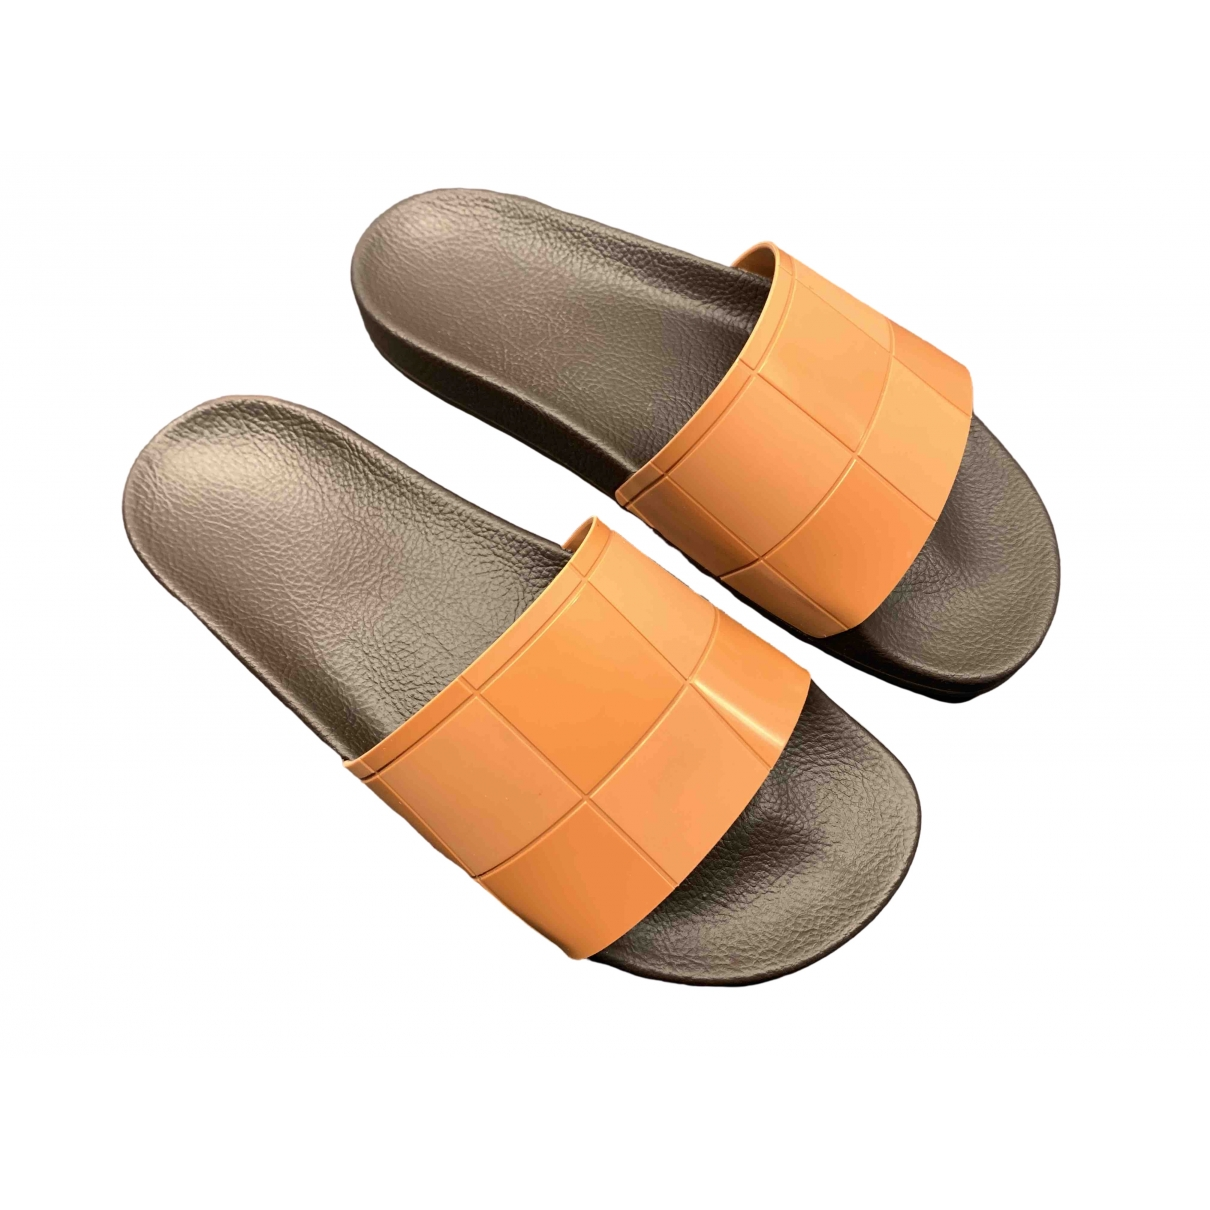 Adidas X Raf Simons \N Sandalen in  Braun Kunststoff